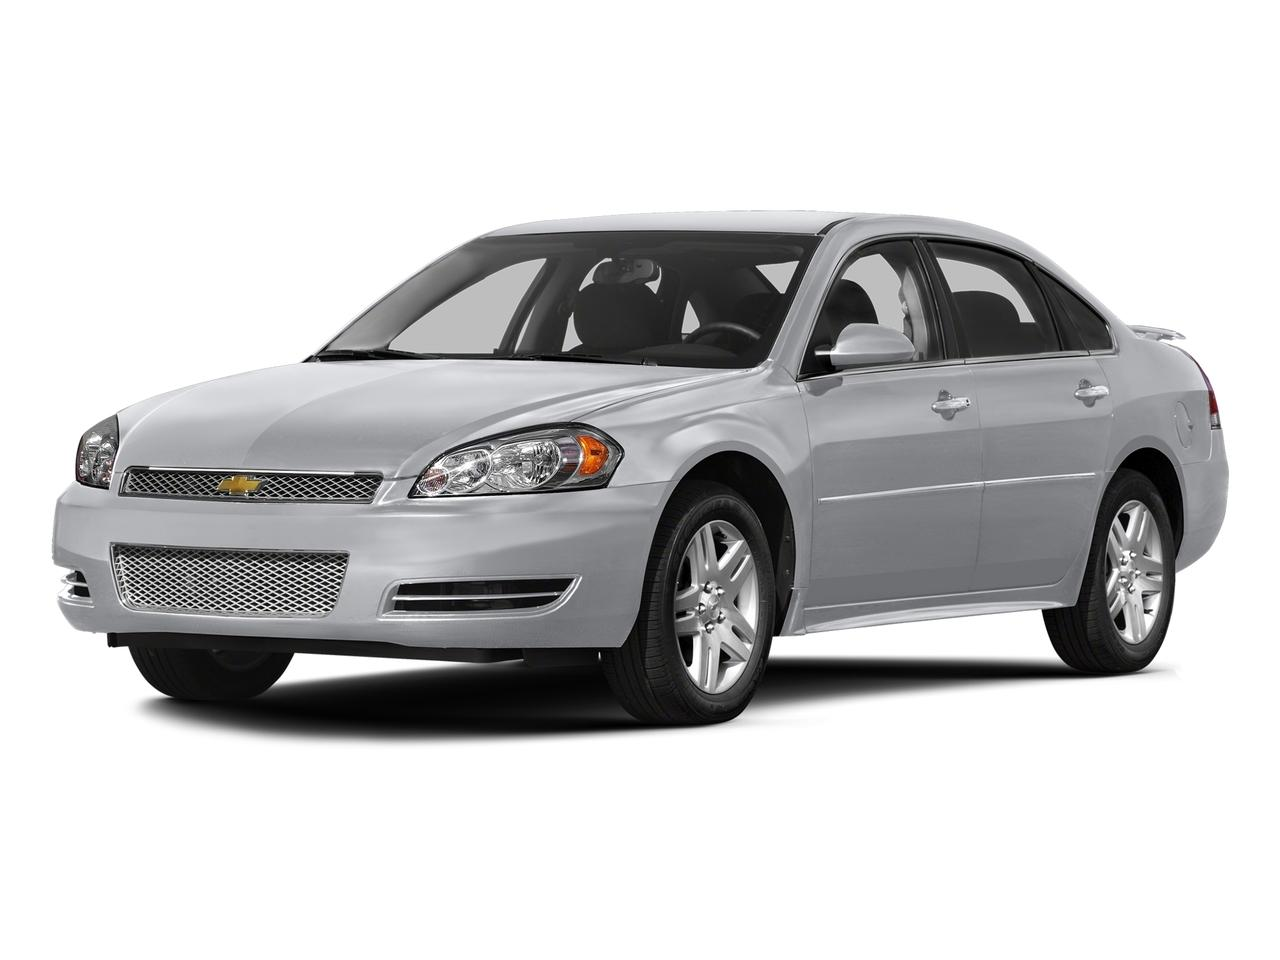 2016 Chevrolet Impala Limited Vehicle Photo in Trinidad, CO 81082